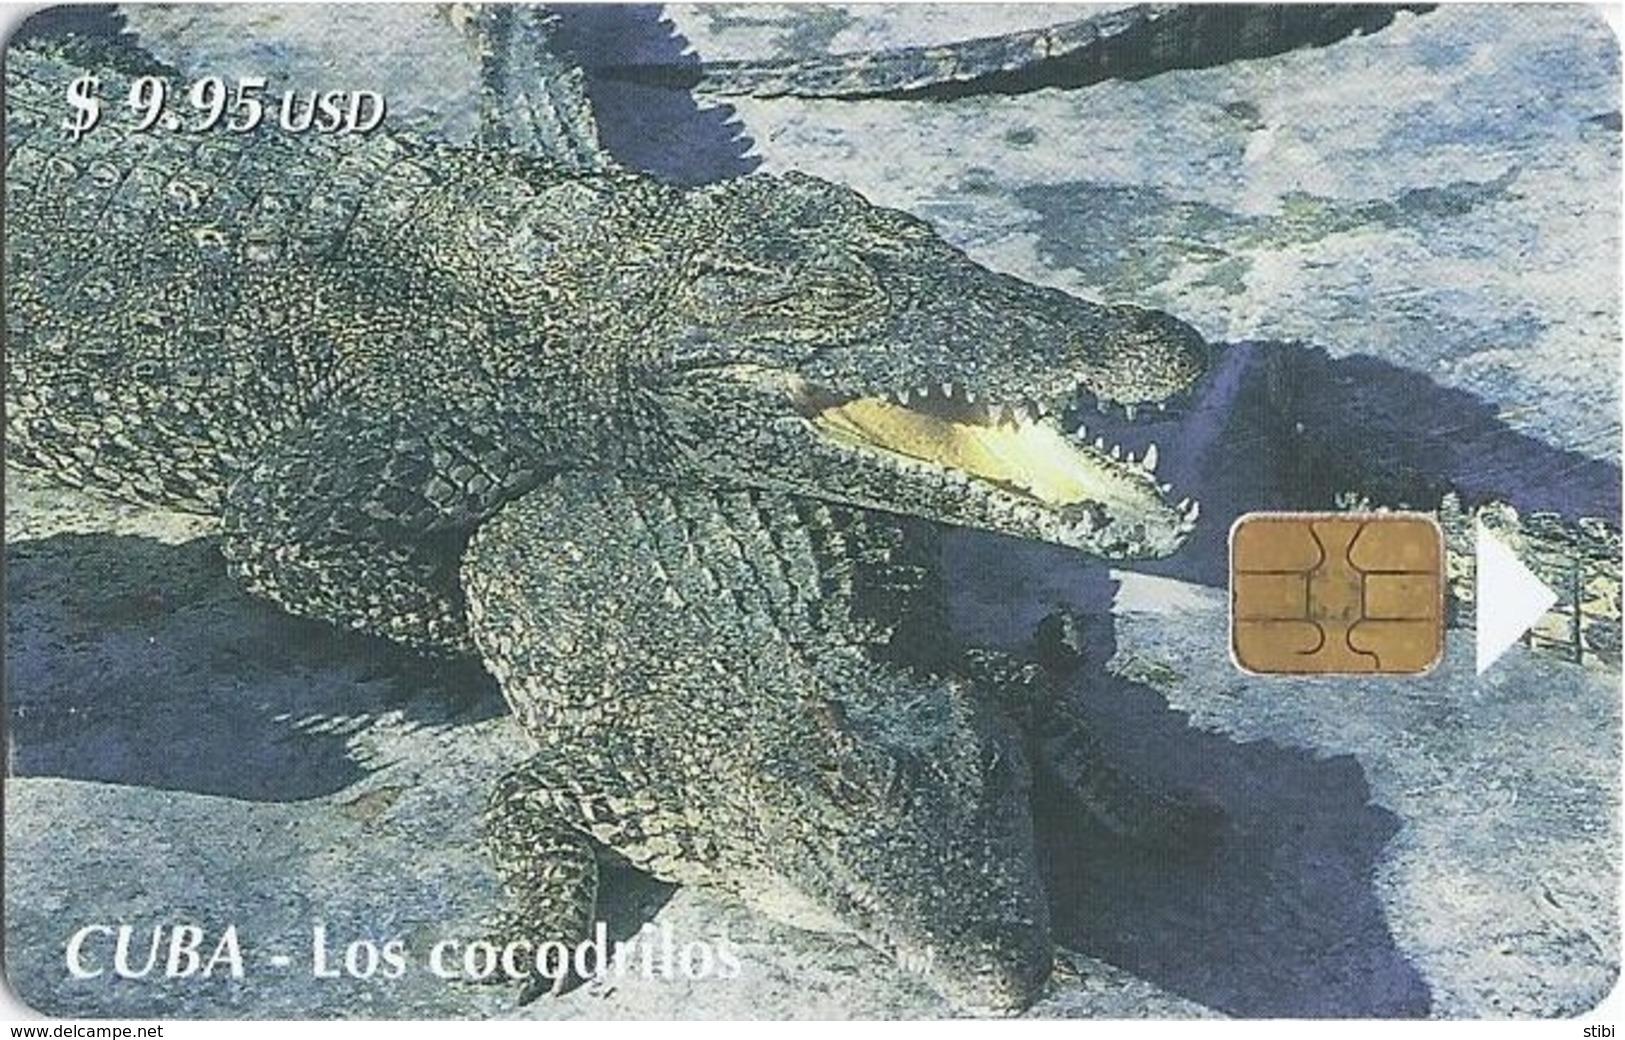 CUBA - CROCODILES - Cuba